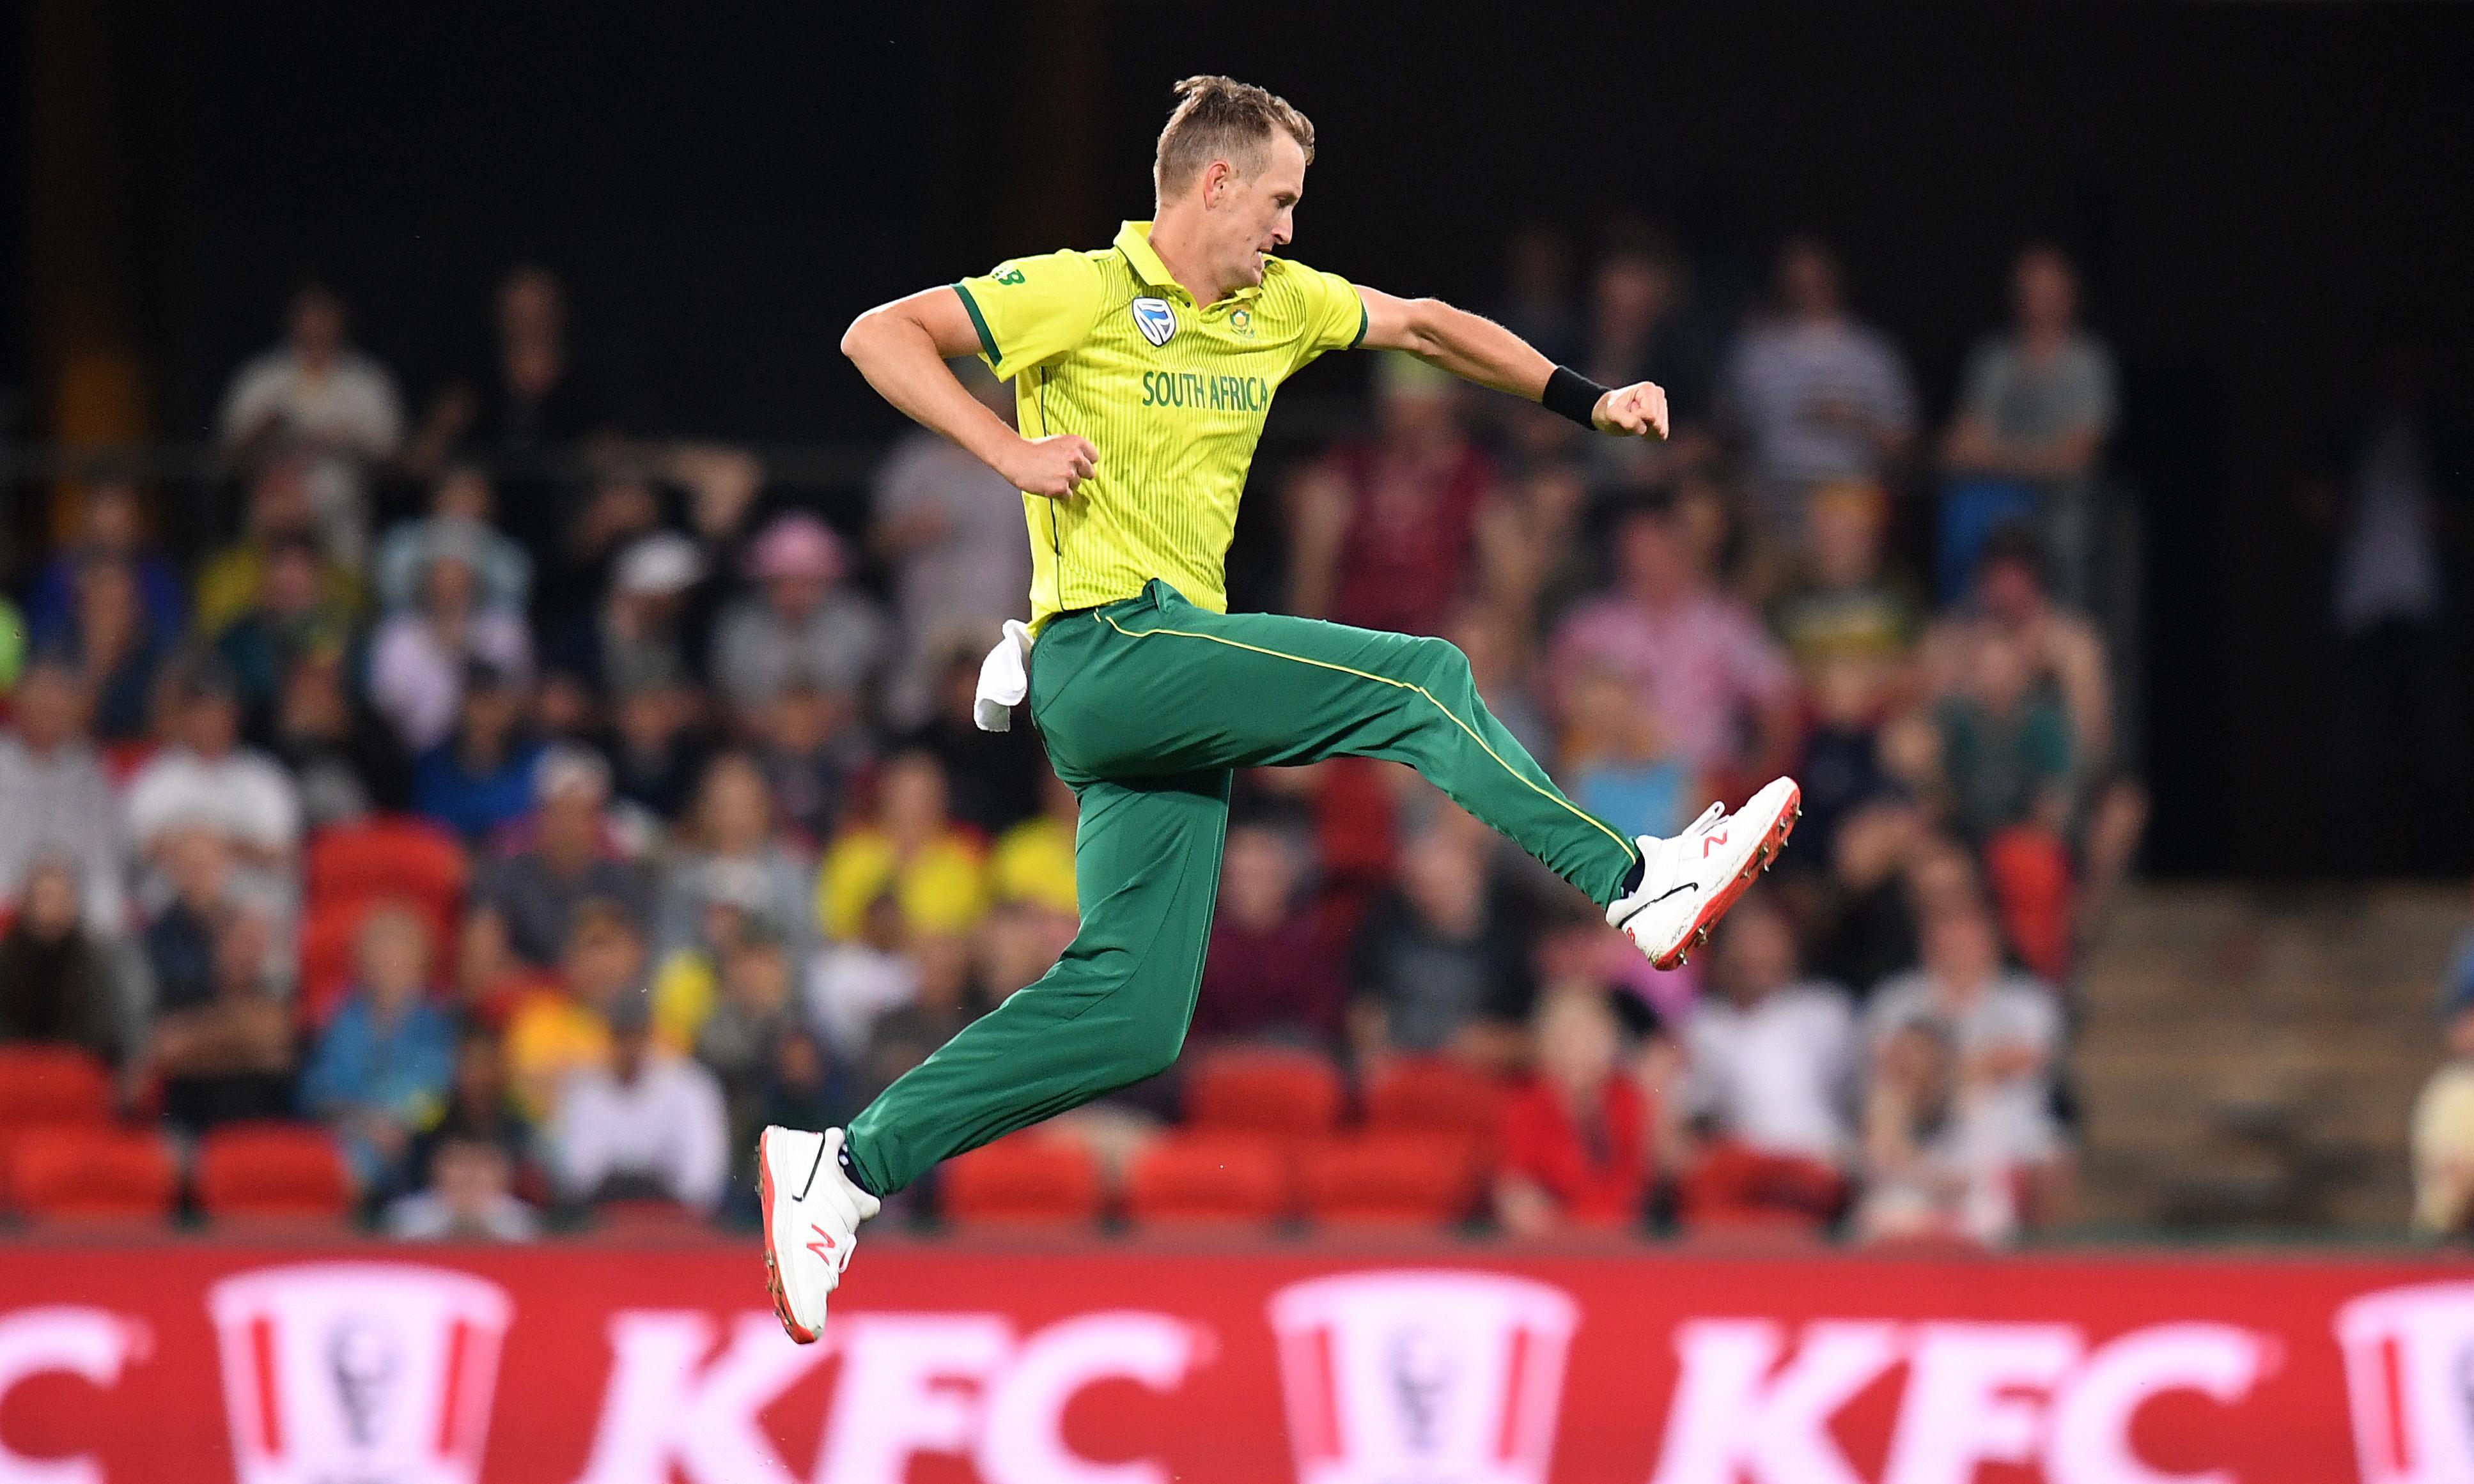 Chris Morris the hero as South Africa beat Australia in truncated T20